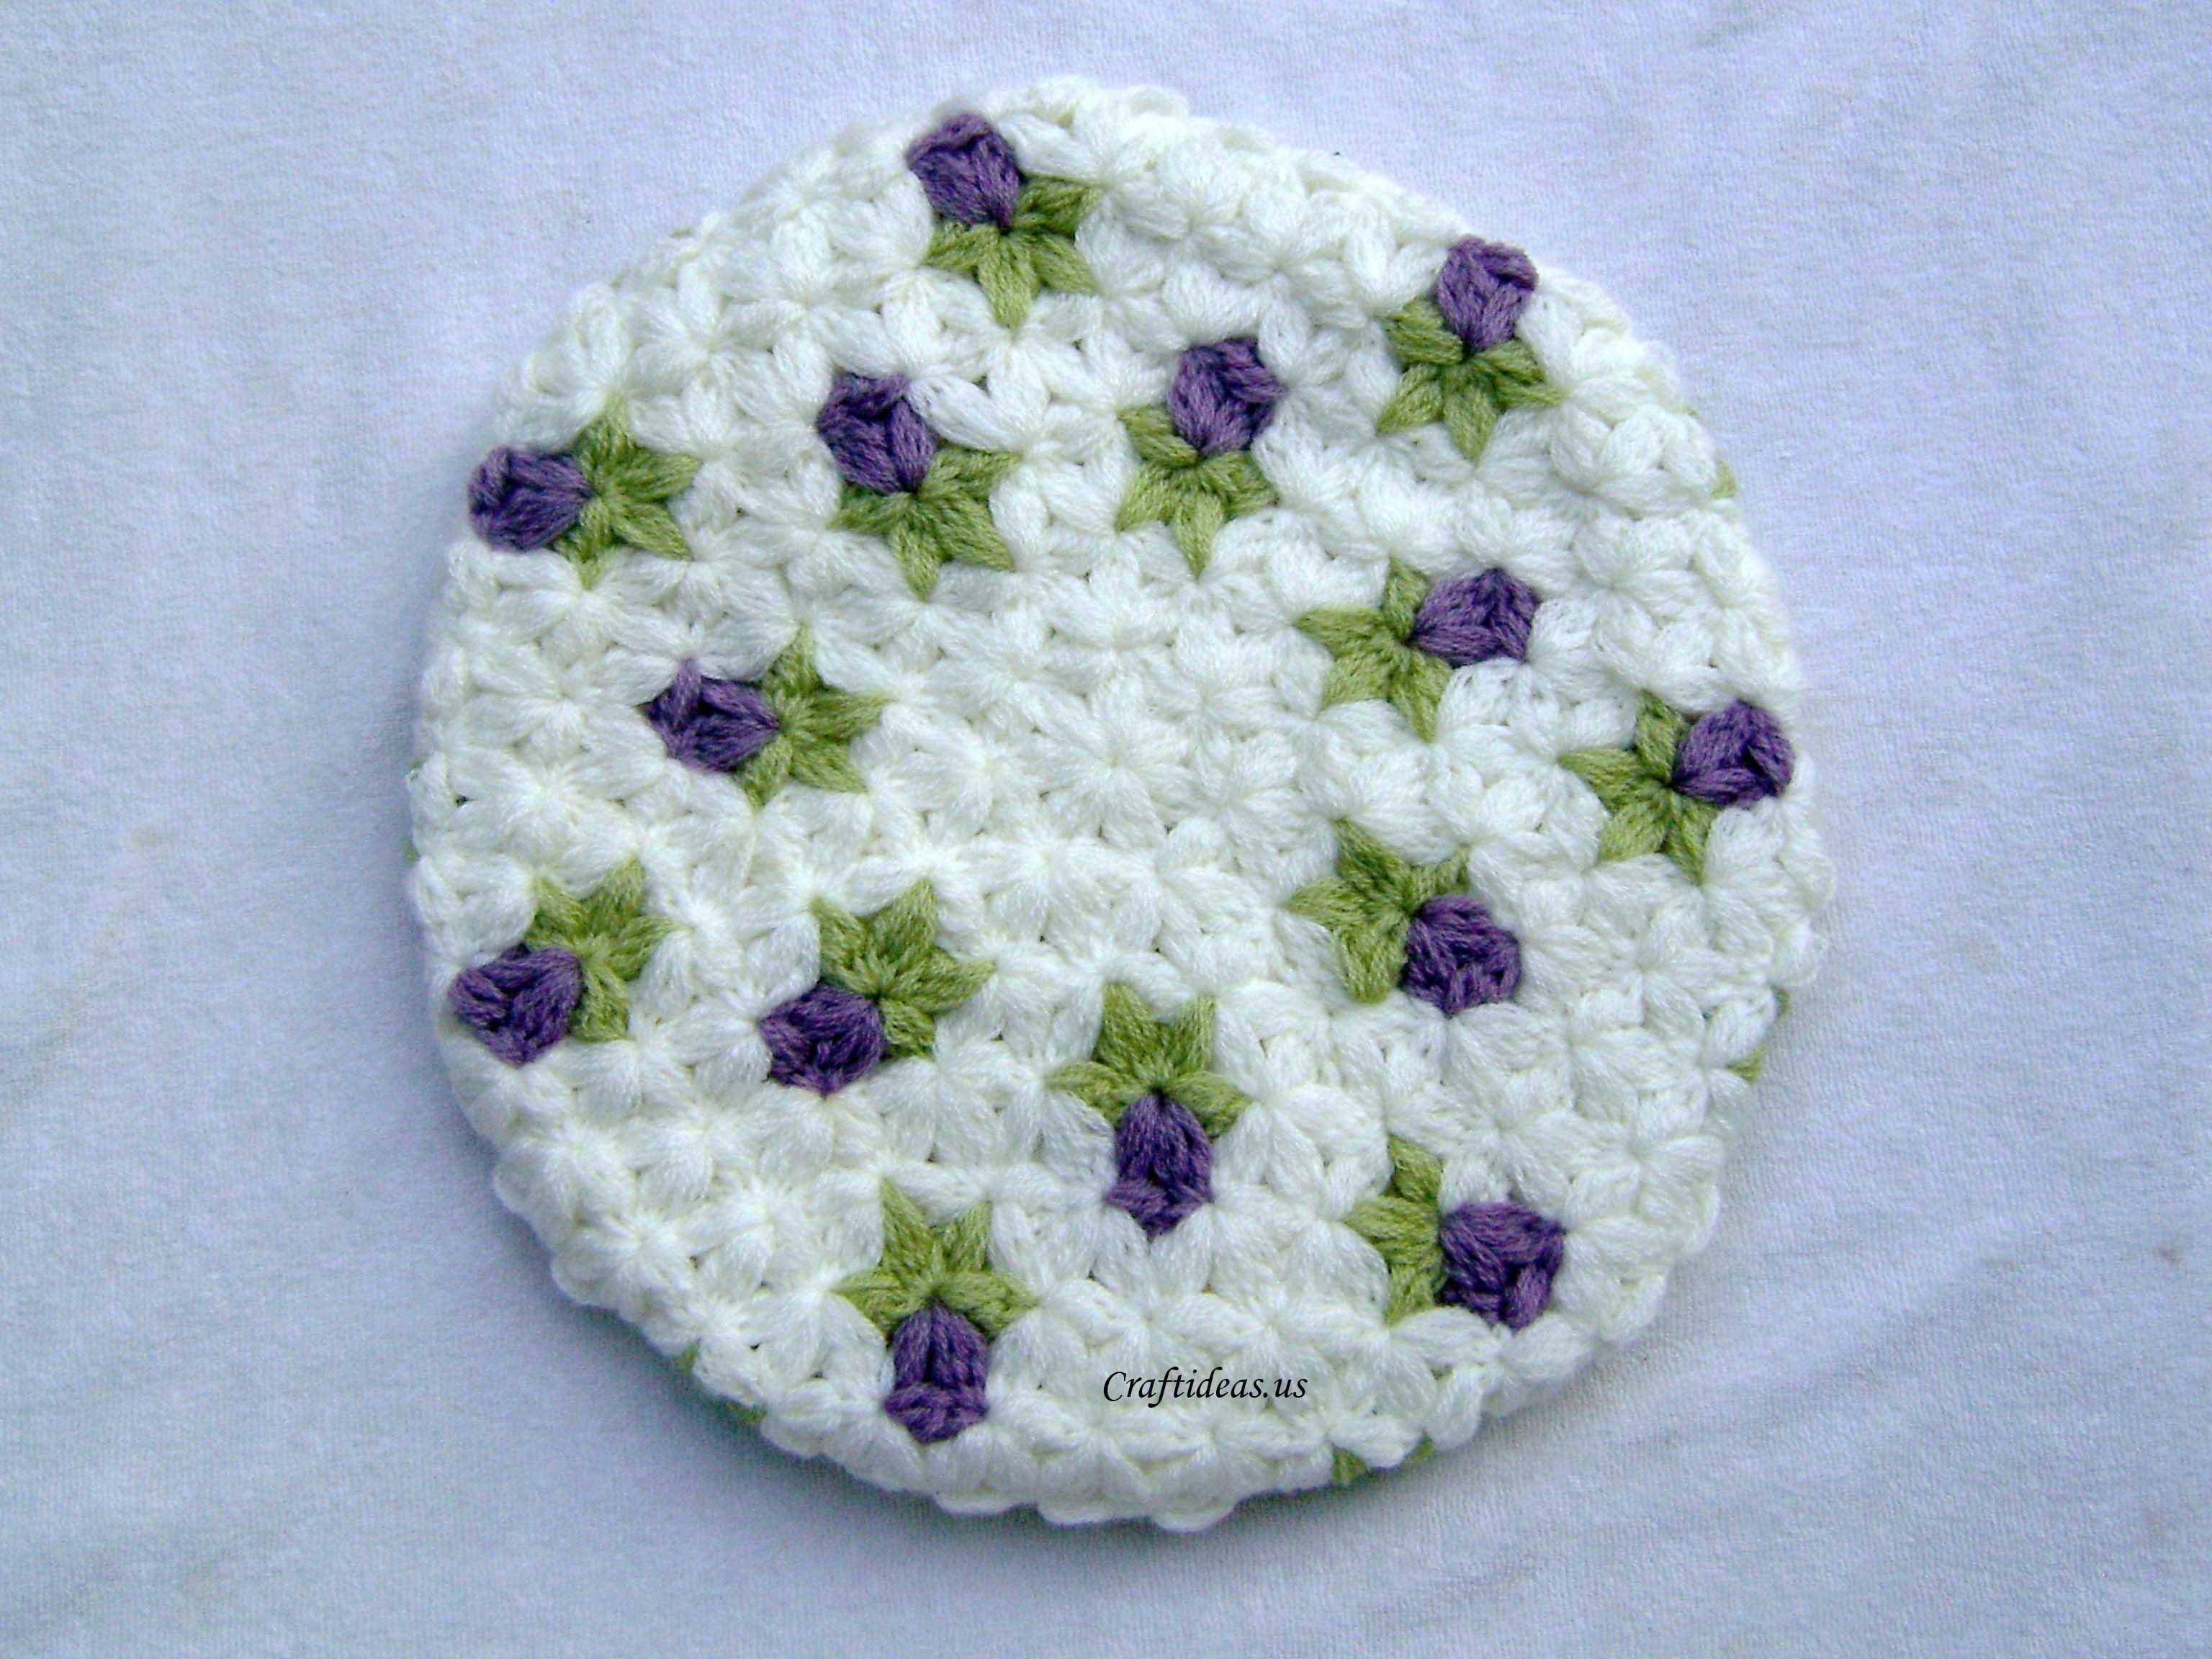 Crochet rose with 6-Petal Jasmine Stitch for beret - Craft Ideas